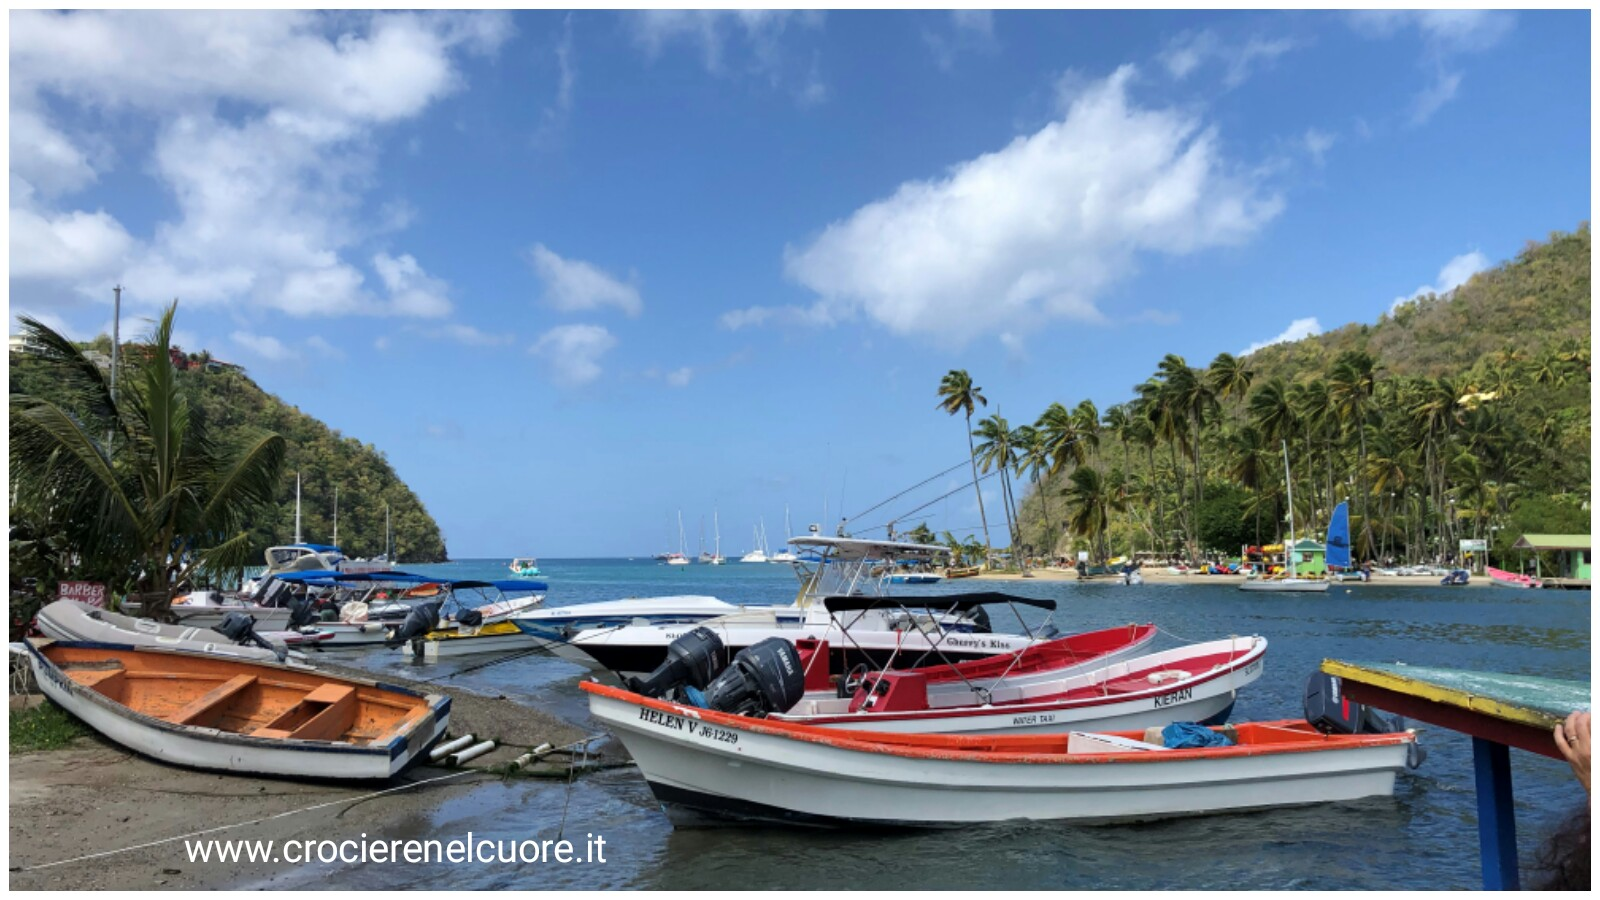 Marigot Bay - crociere nel cuore